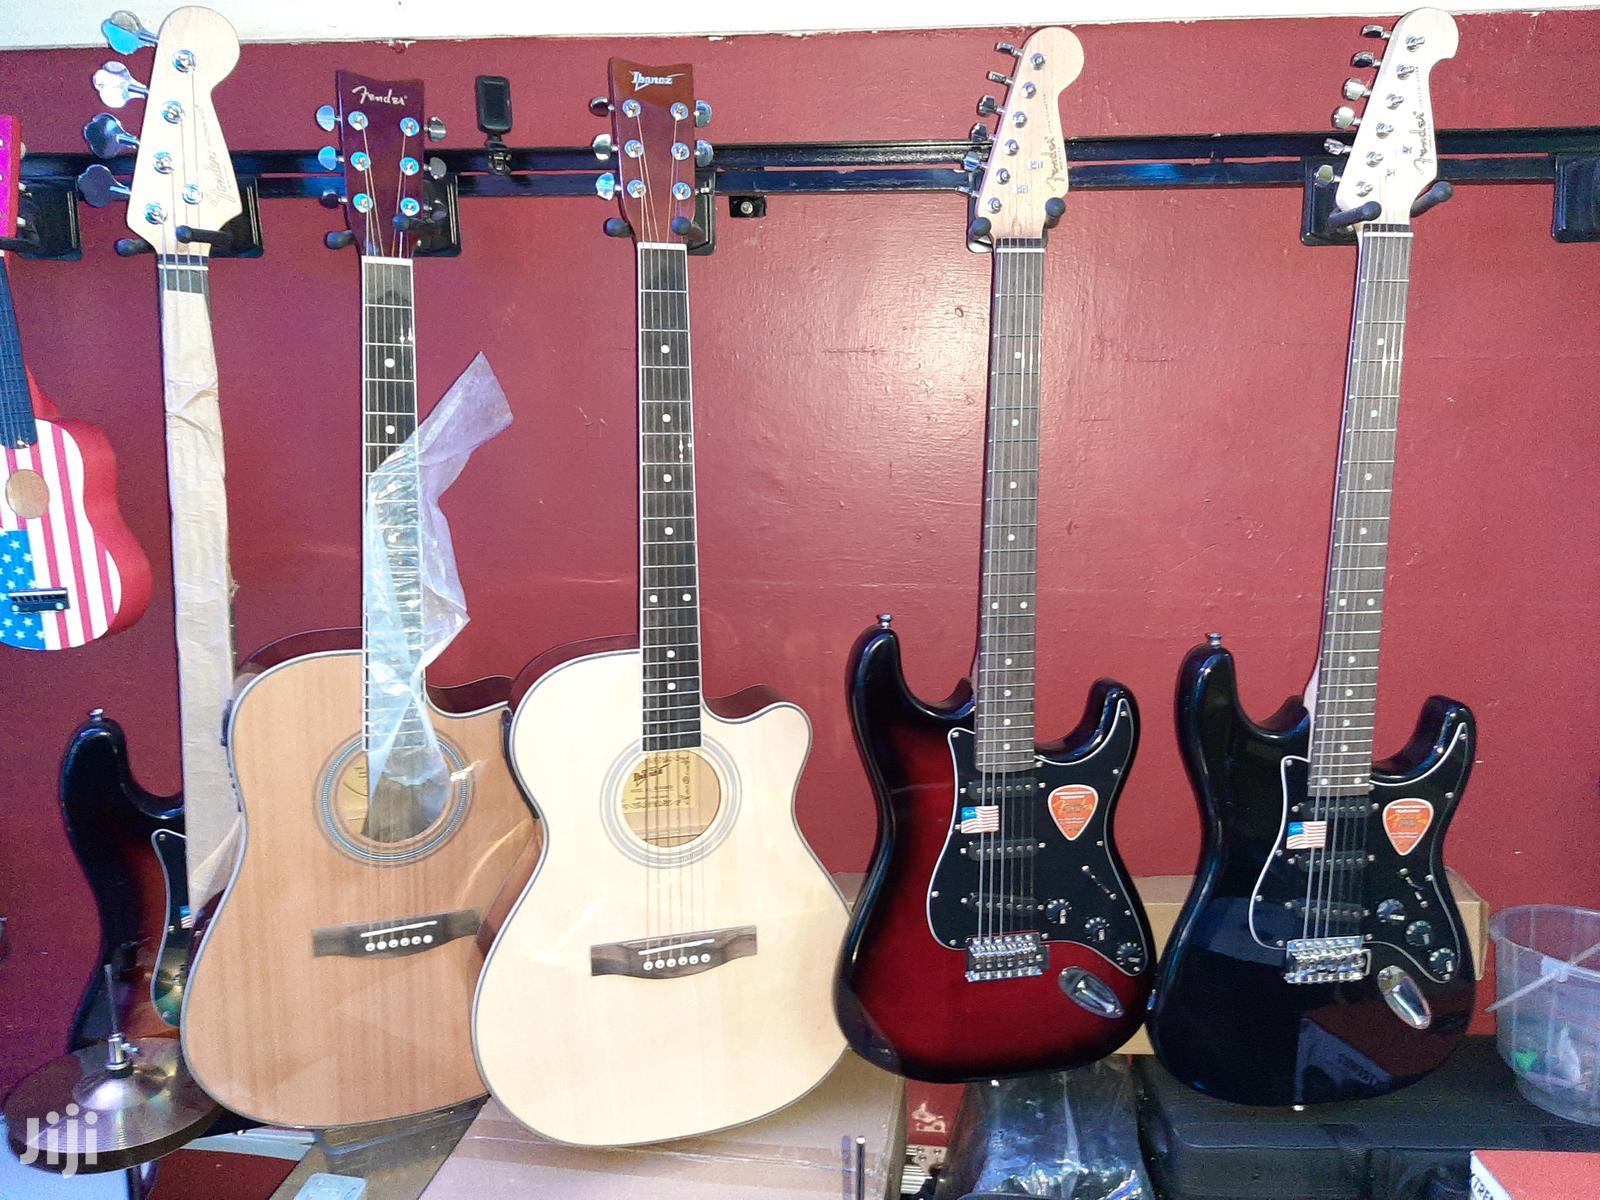 Professional Guitars | Musical Instruments & Gear for sale in Nairobi Central, Nairobi, Kenya